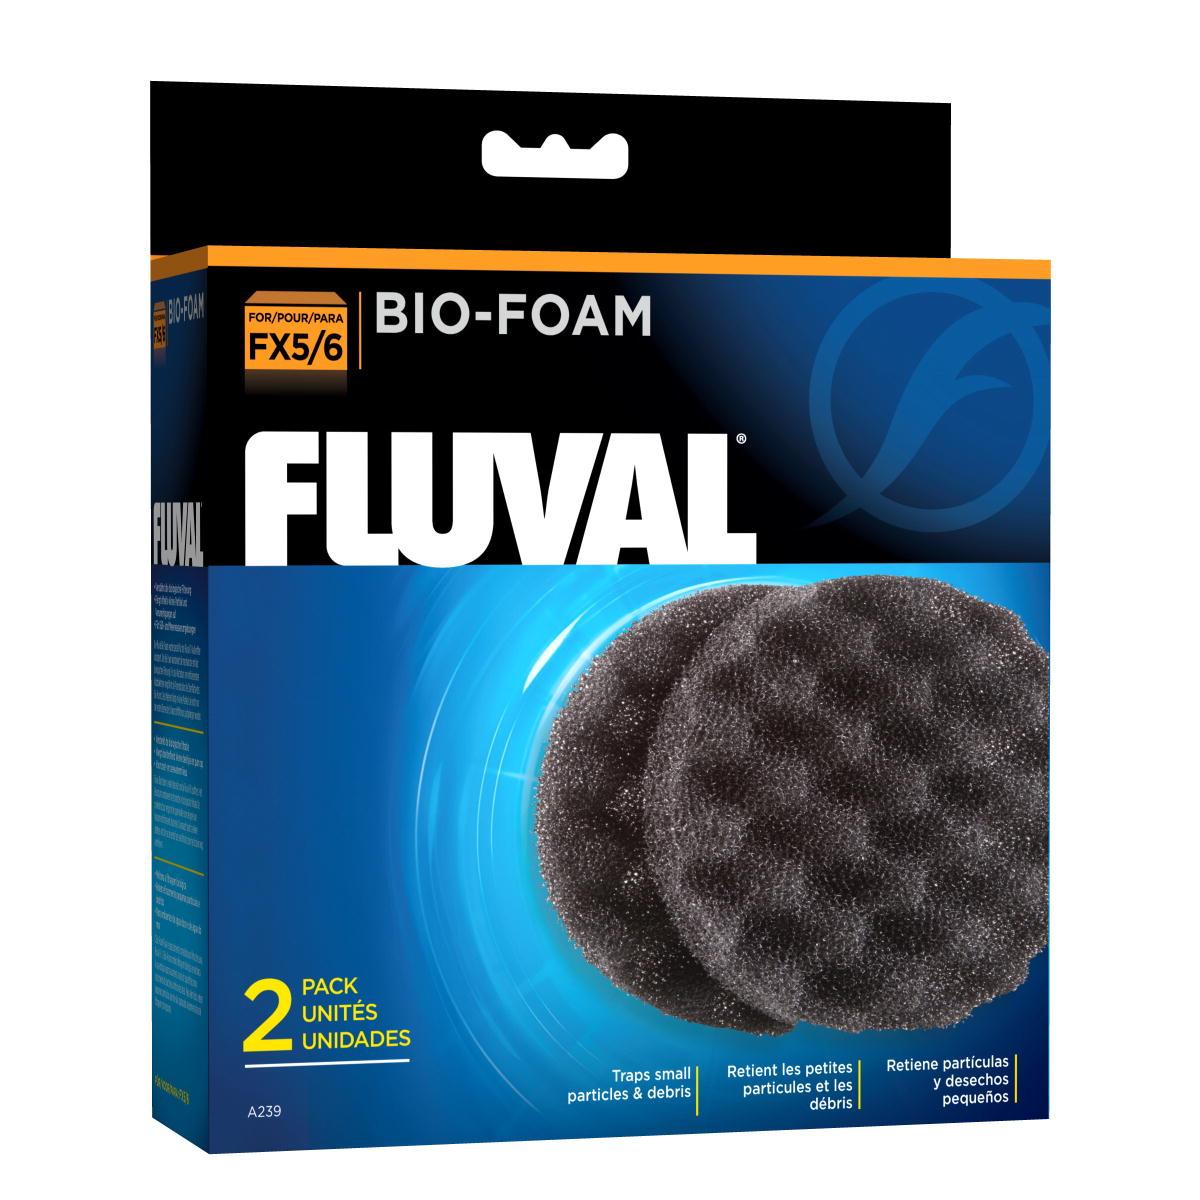 Fluval A239 Fx5 6 Filter Media Biofoam 2Pack